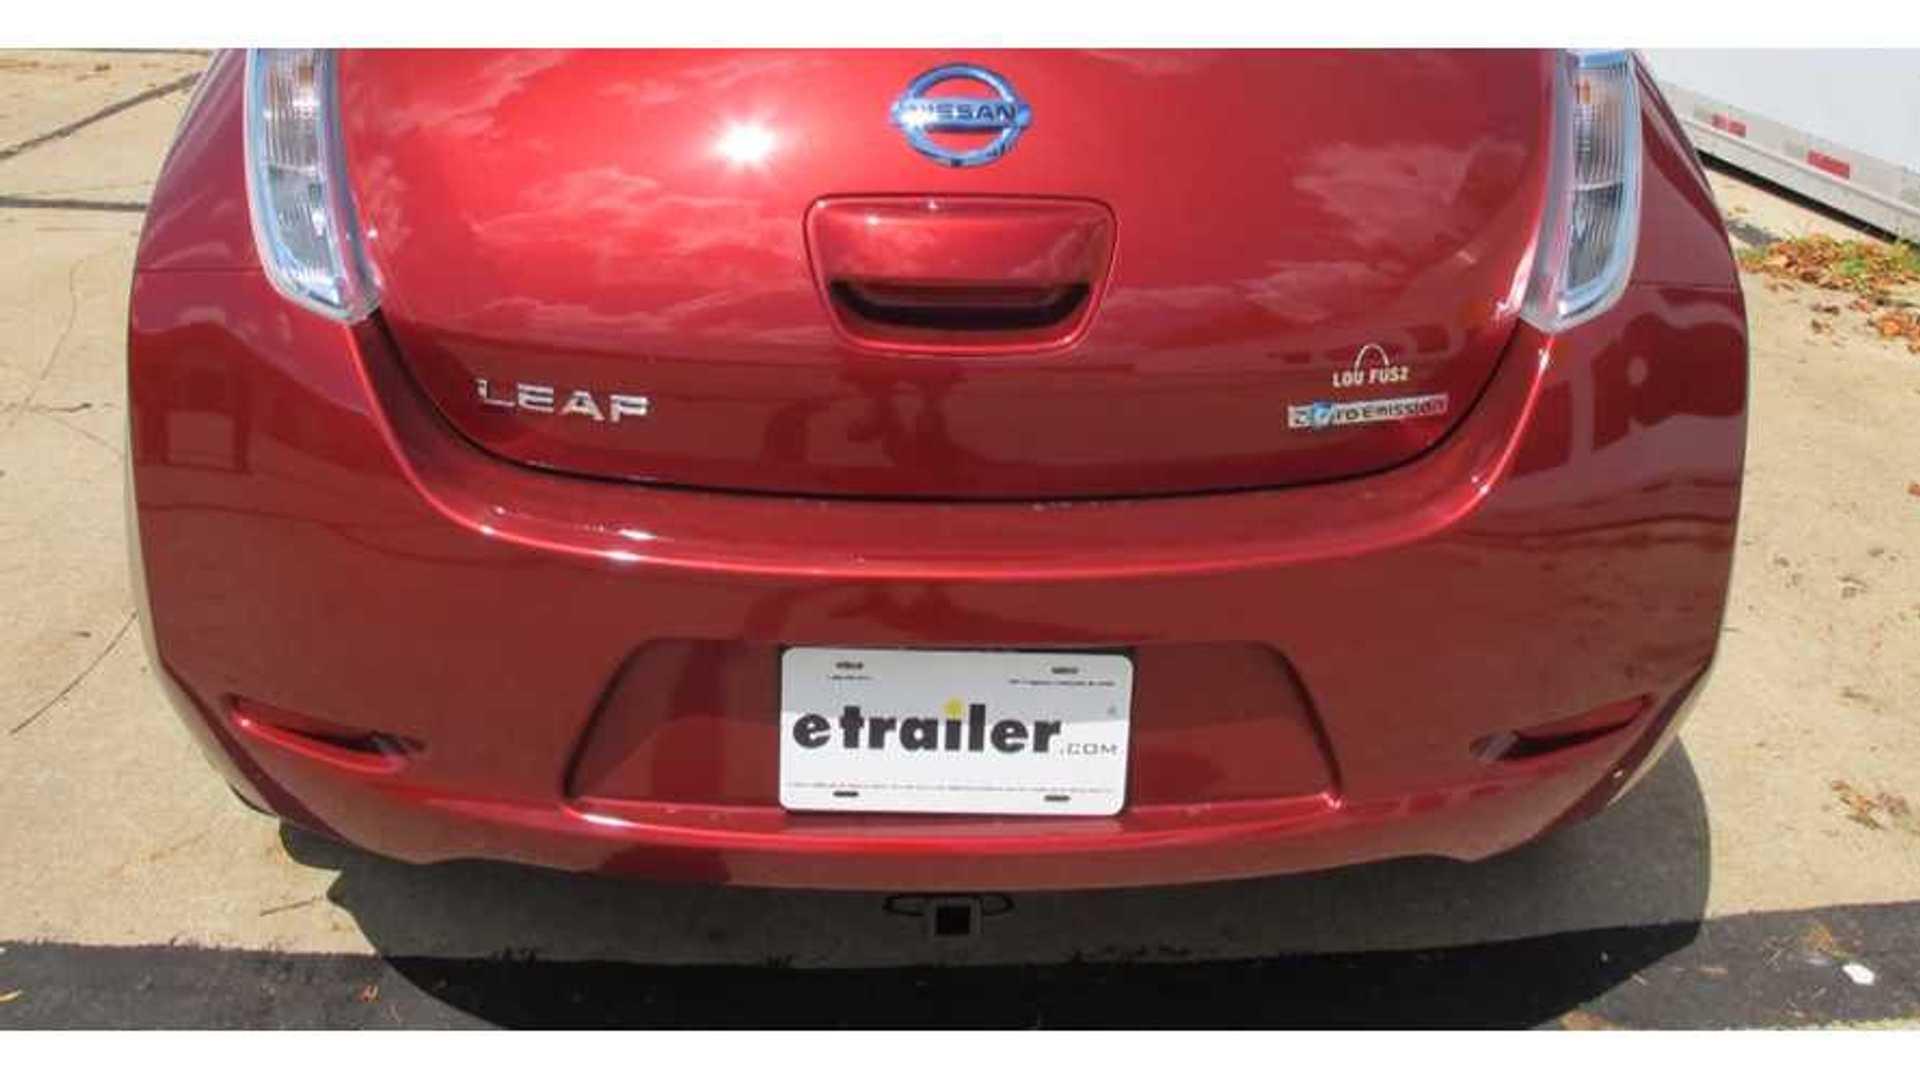 Fine Nissan Leaf Trailer Hitch Installation Video Insideevs Photos Wiring Cloud Peadfoxcilixyz